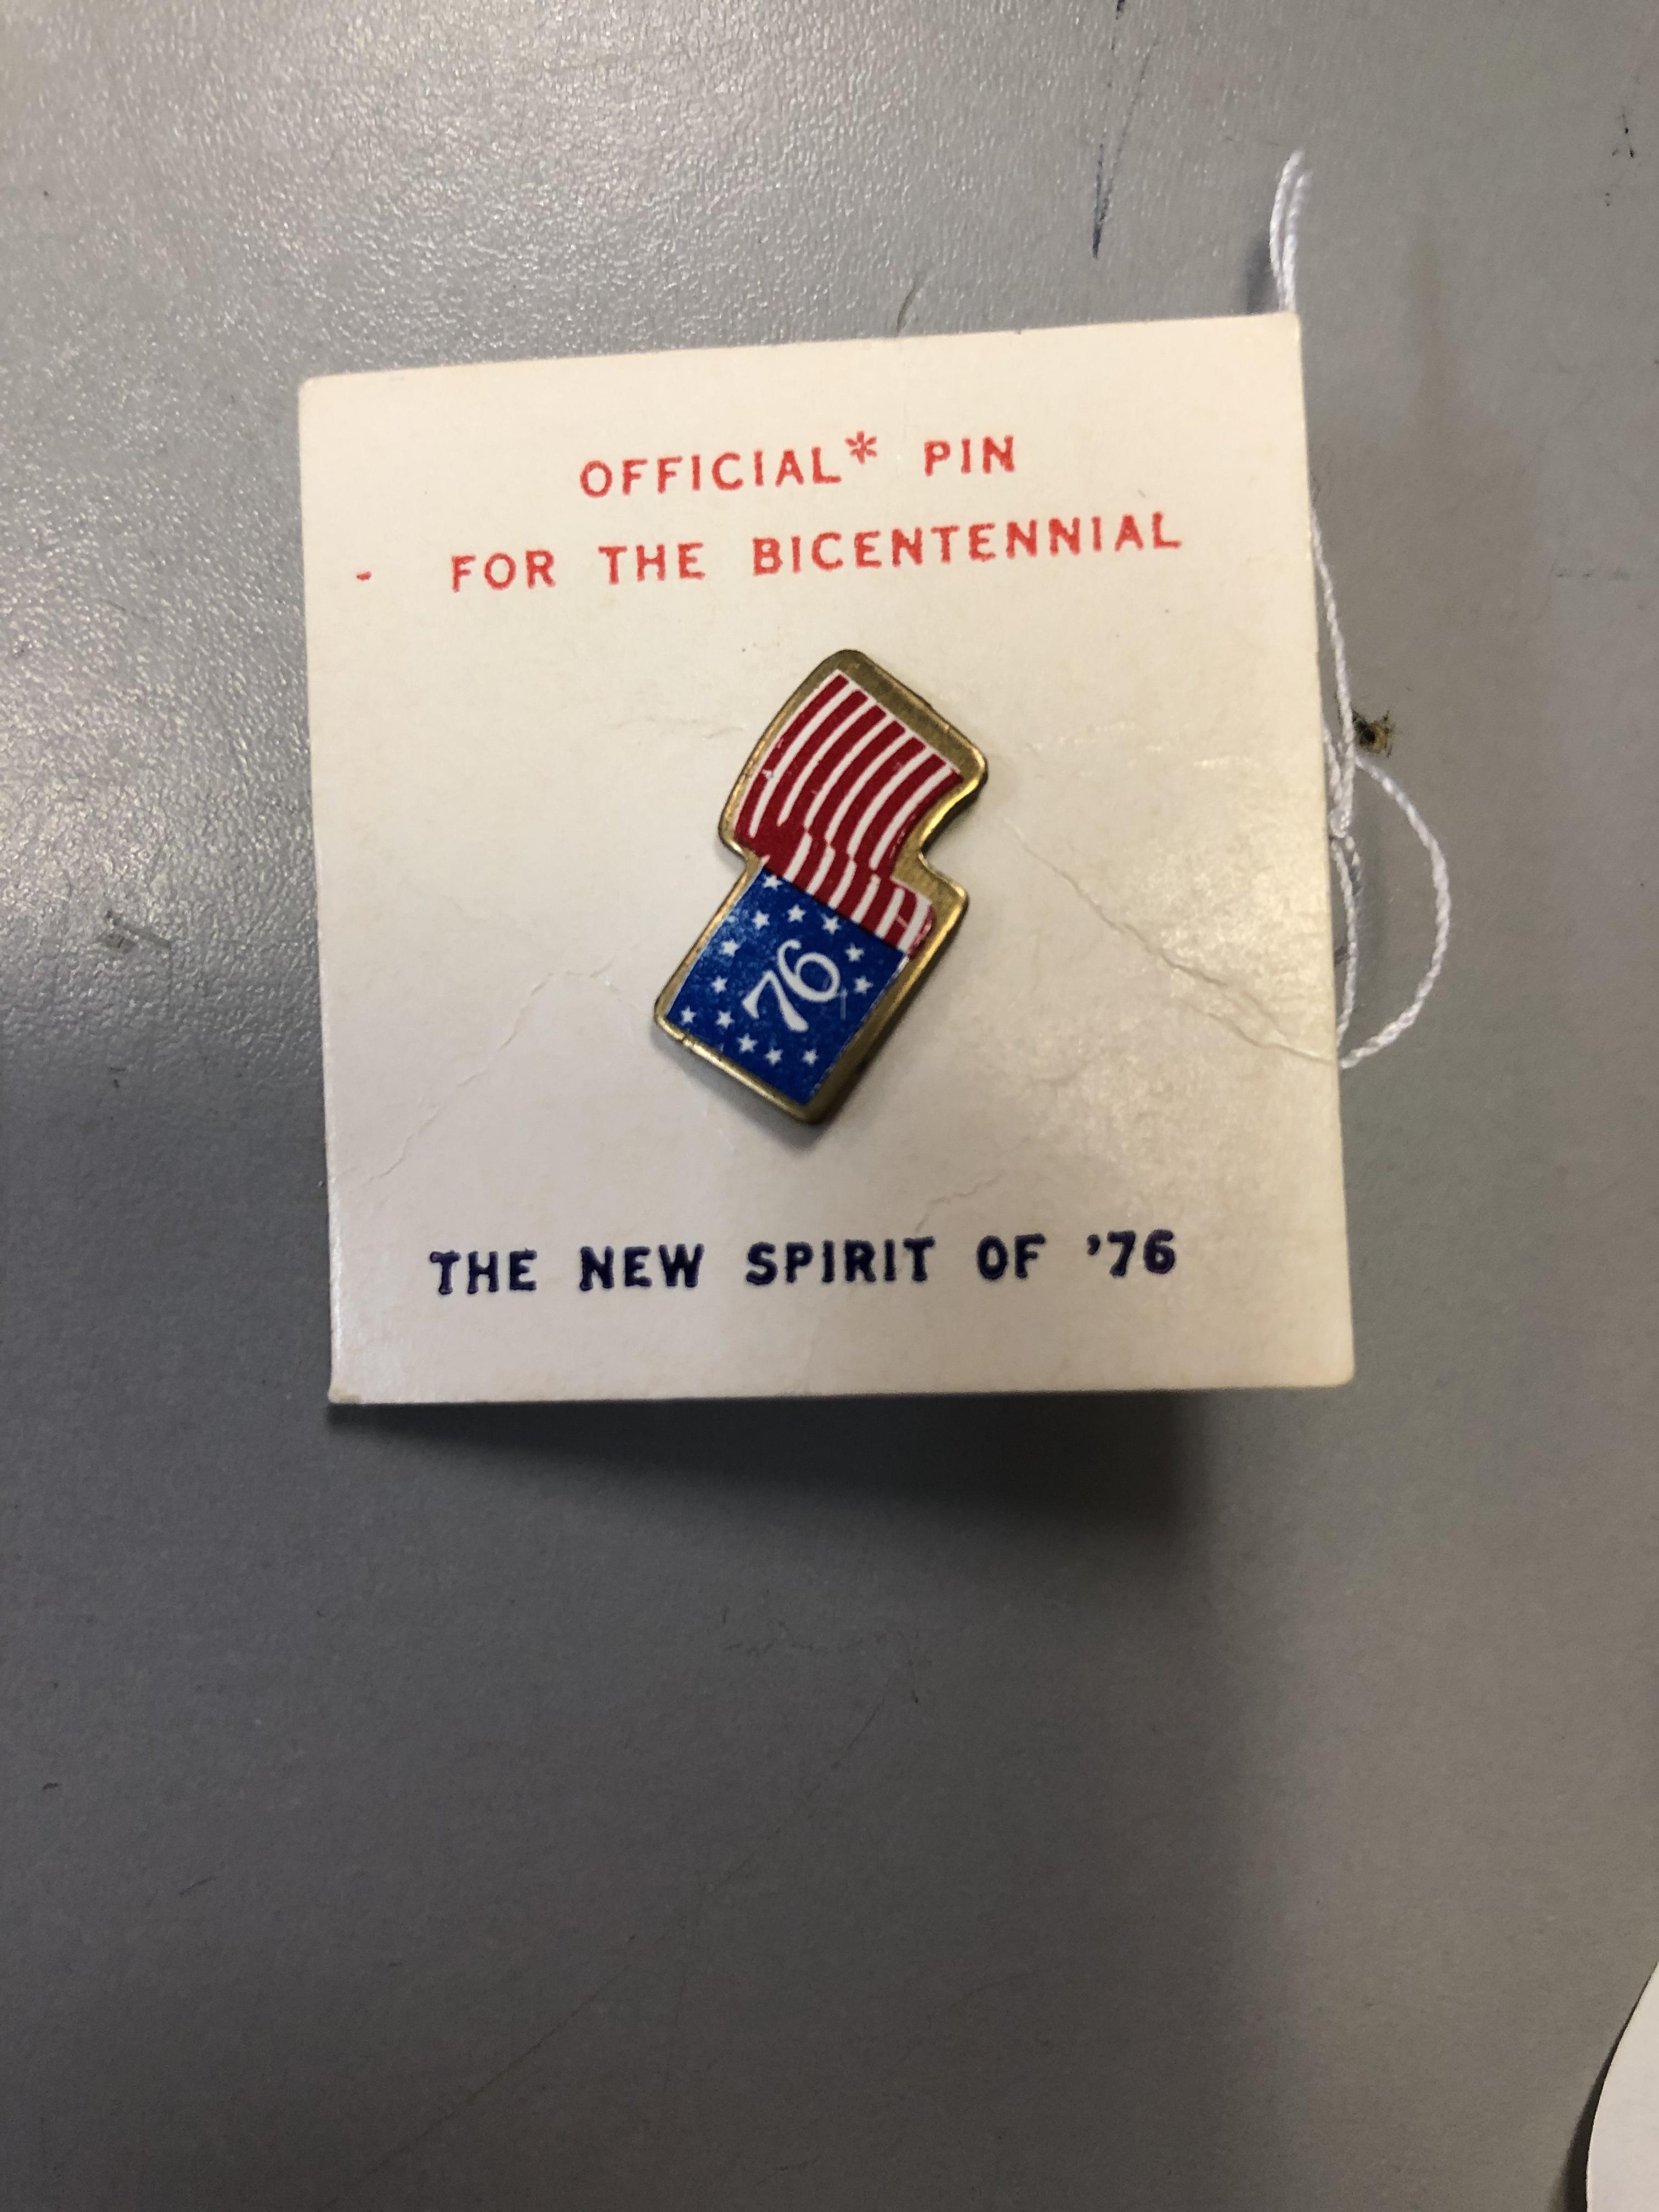 Pin of the Bicentennial Spirit of 76